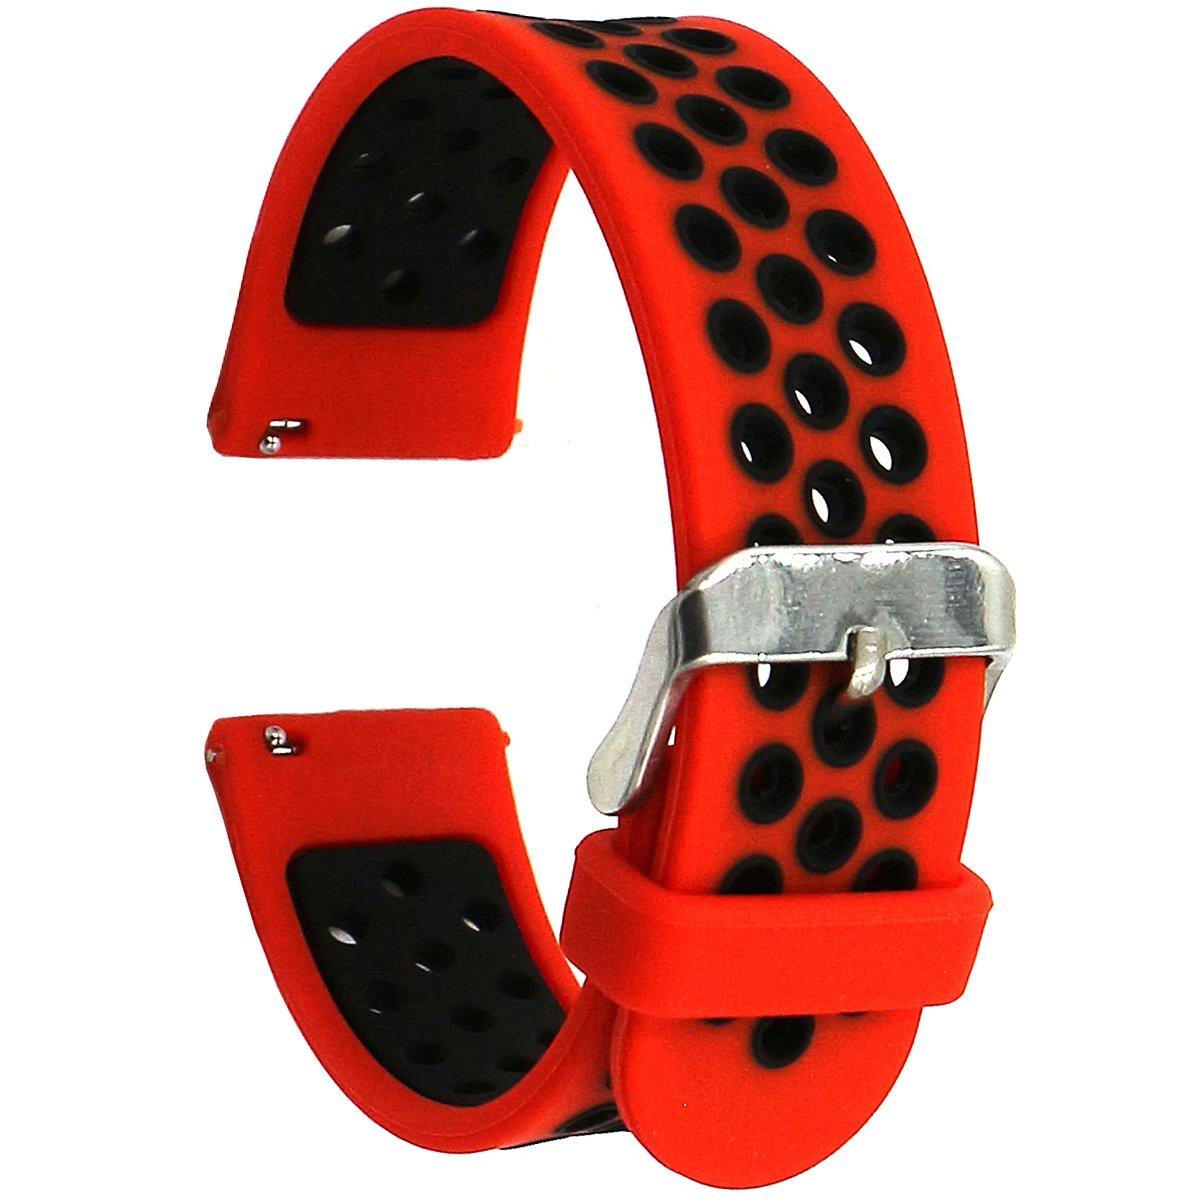 Elespoto 20mm Correa para Motorola Moto 360 2 generación 42 mm/Samsung Gear S2 Classic/Gear Sport/Huawe Watch 2 Sport/Withings Steel HR 40mm Reloj ...